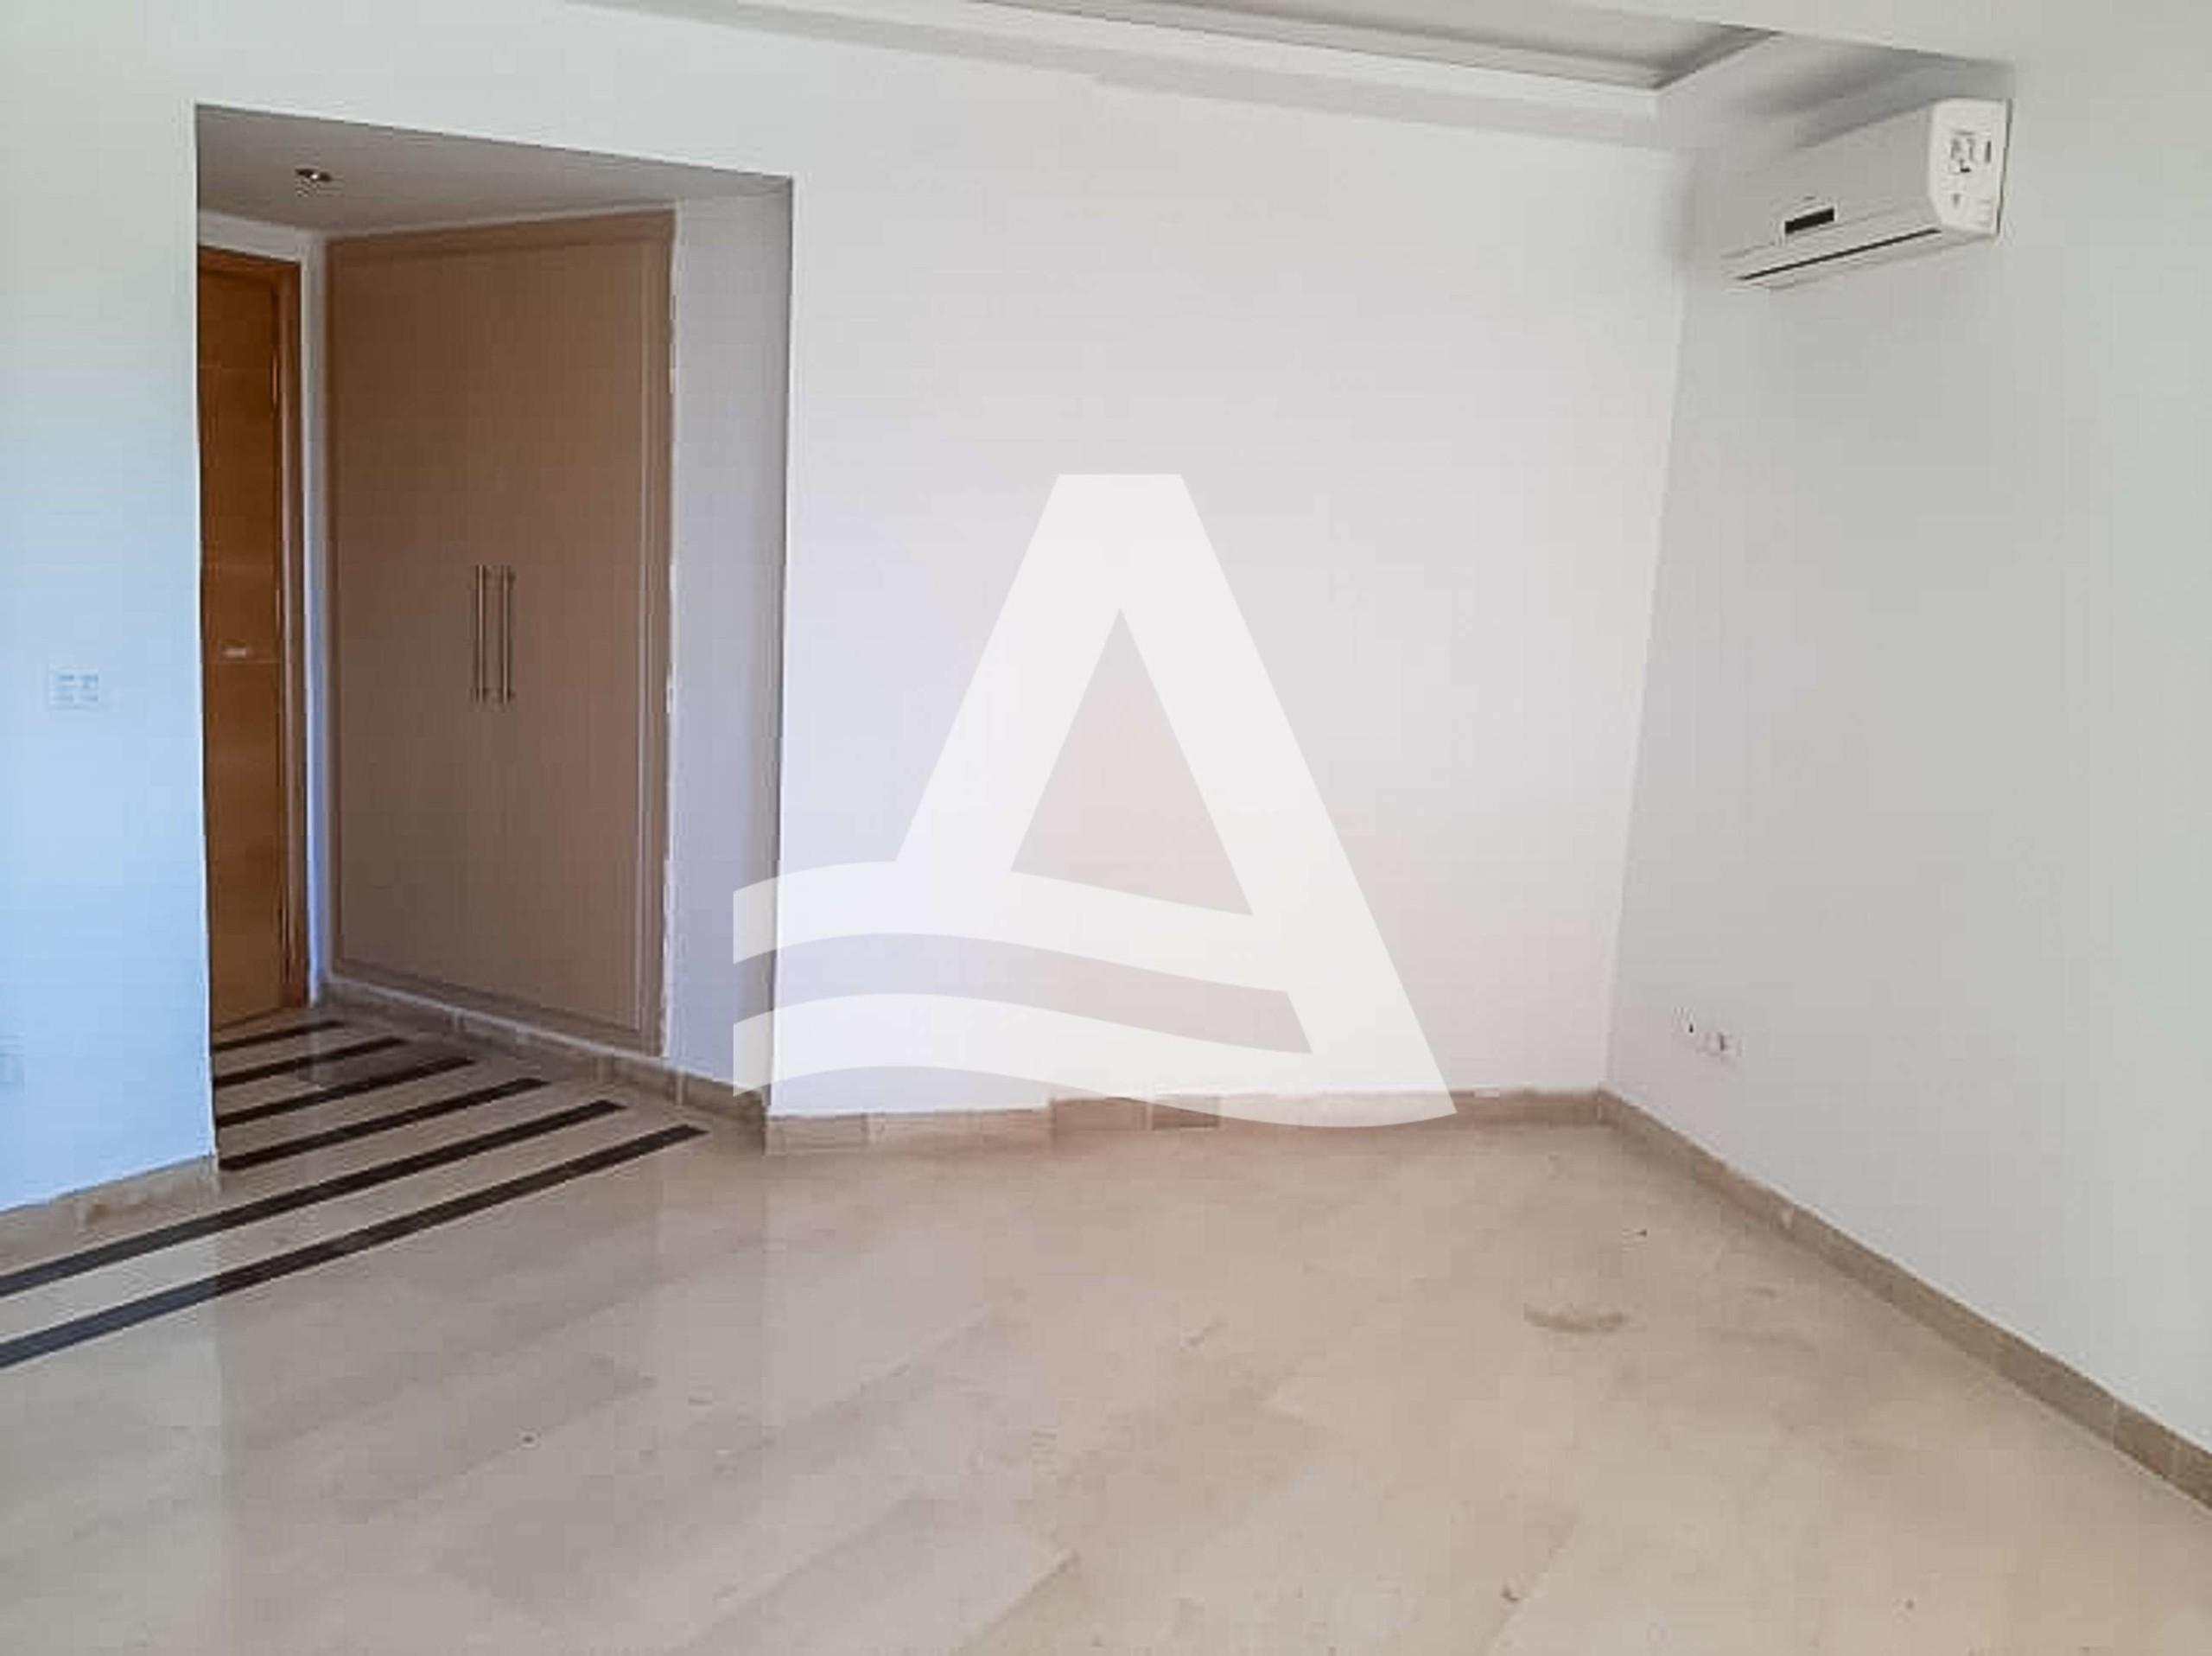 8745509551589196872_Arcane_immobilière_la_Marsa-_location_-_vente_la_marsa__-11